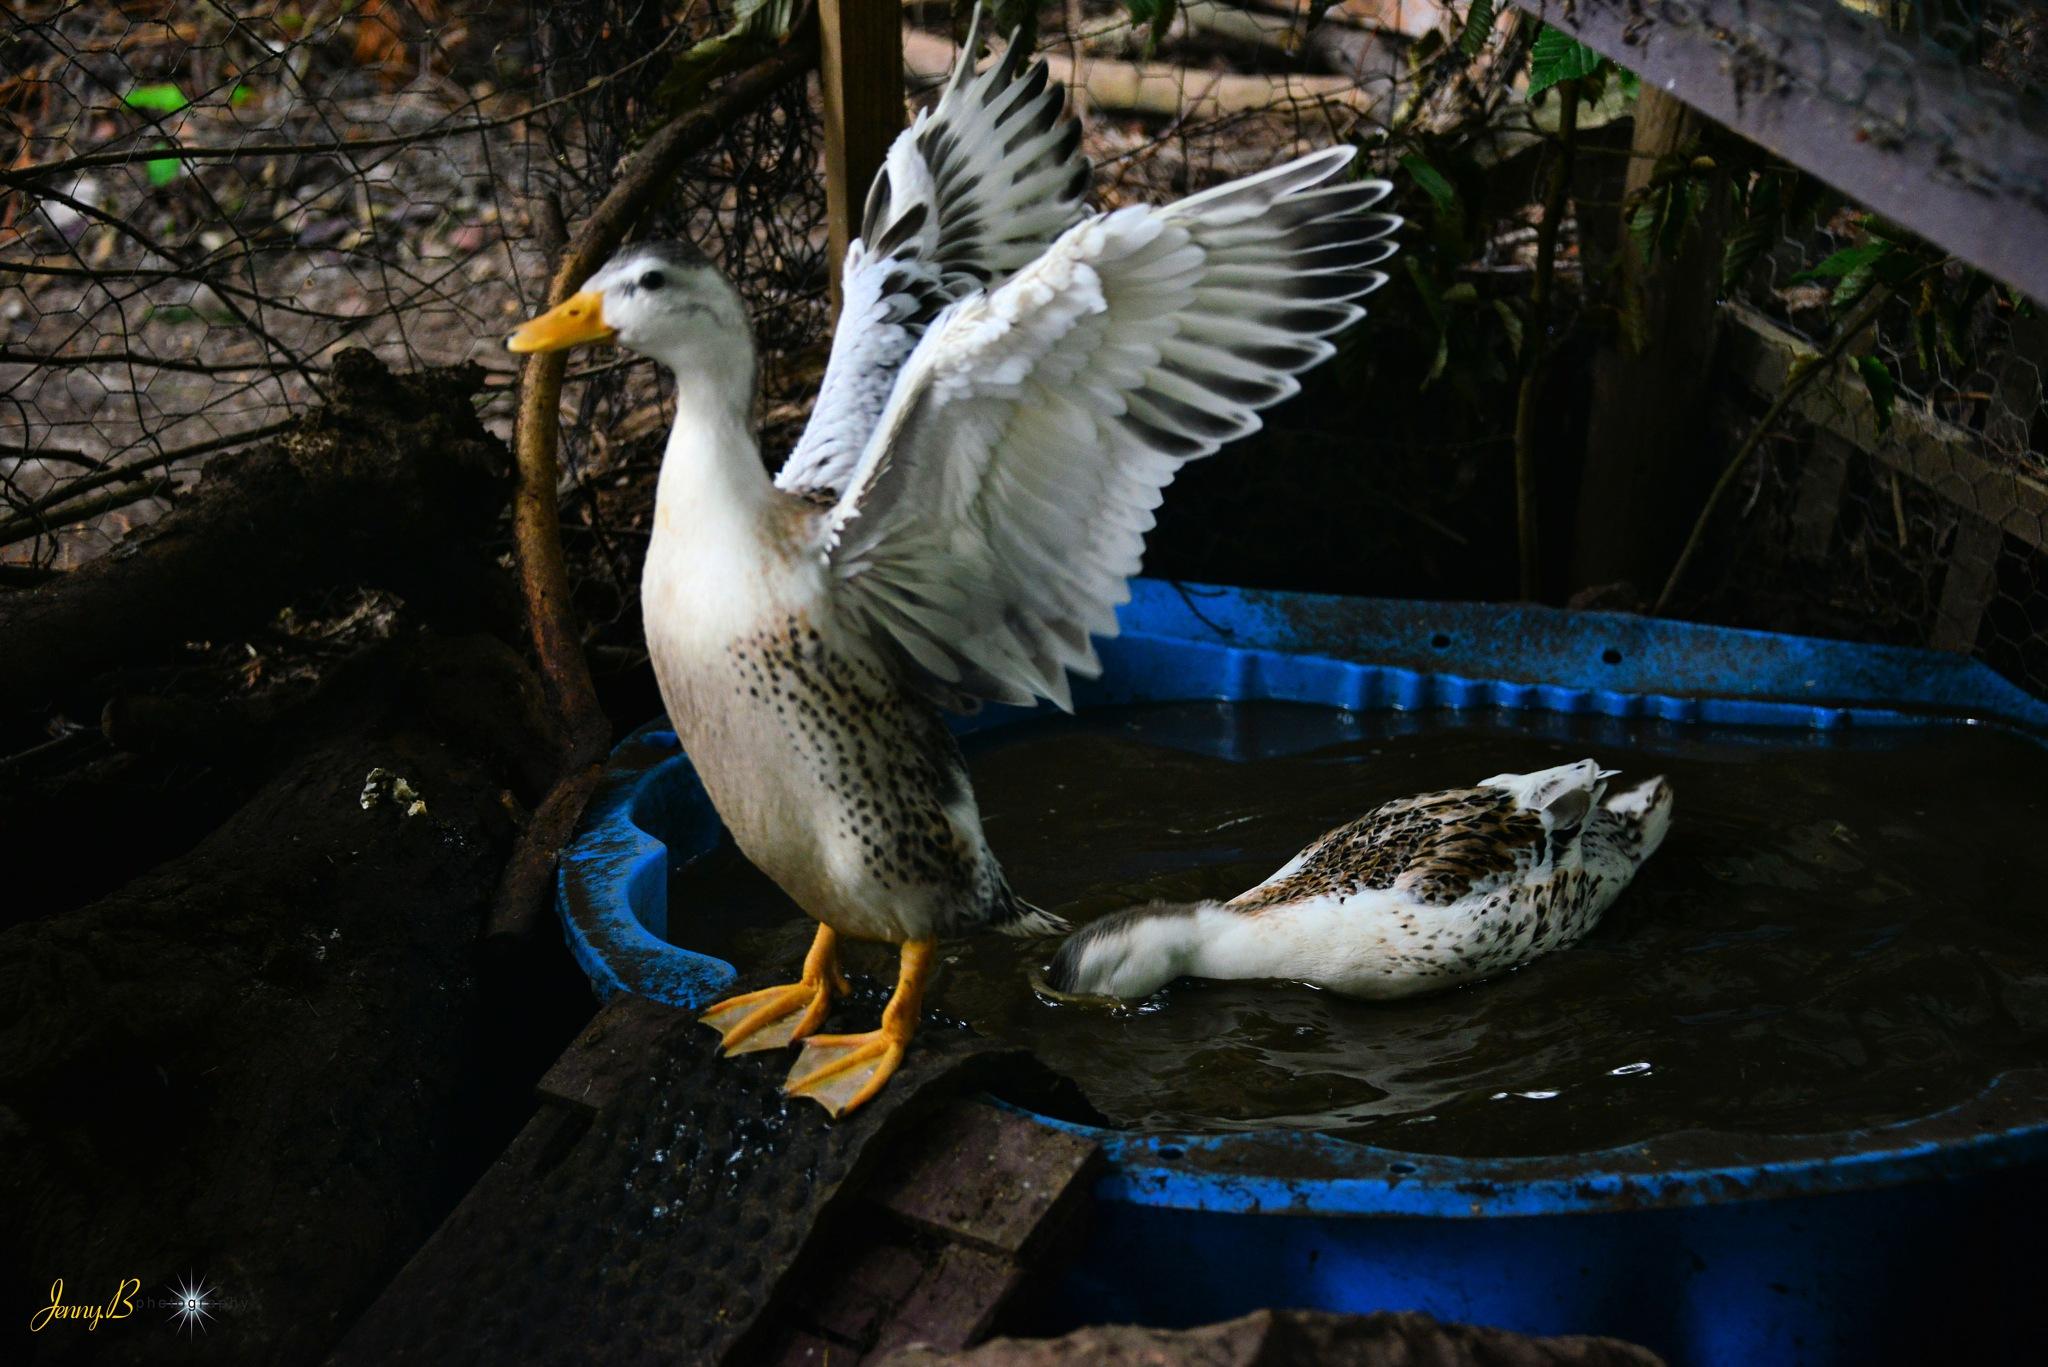 Ducks in the garden  by jb_127  ( jennybphotography)